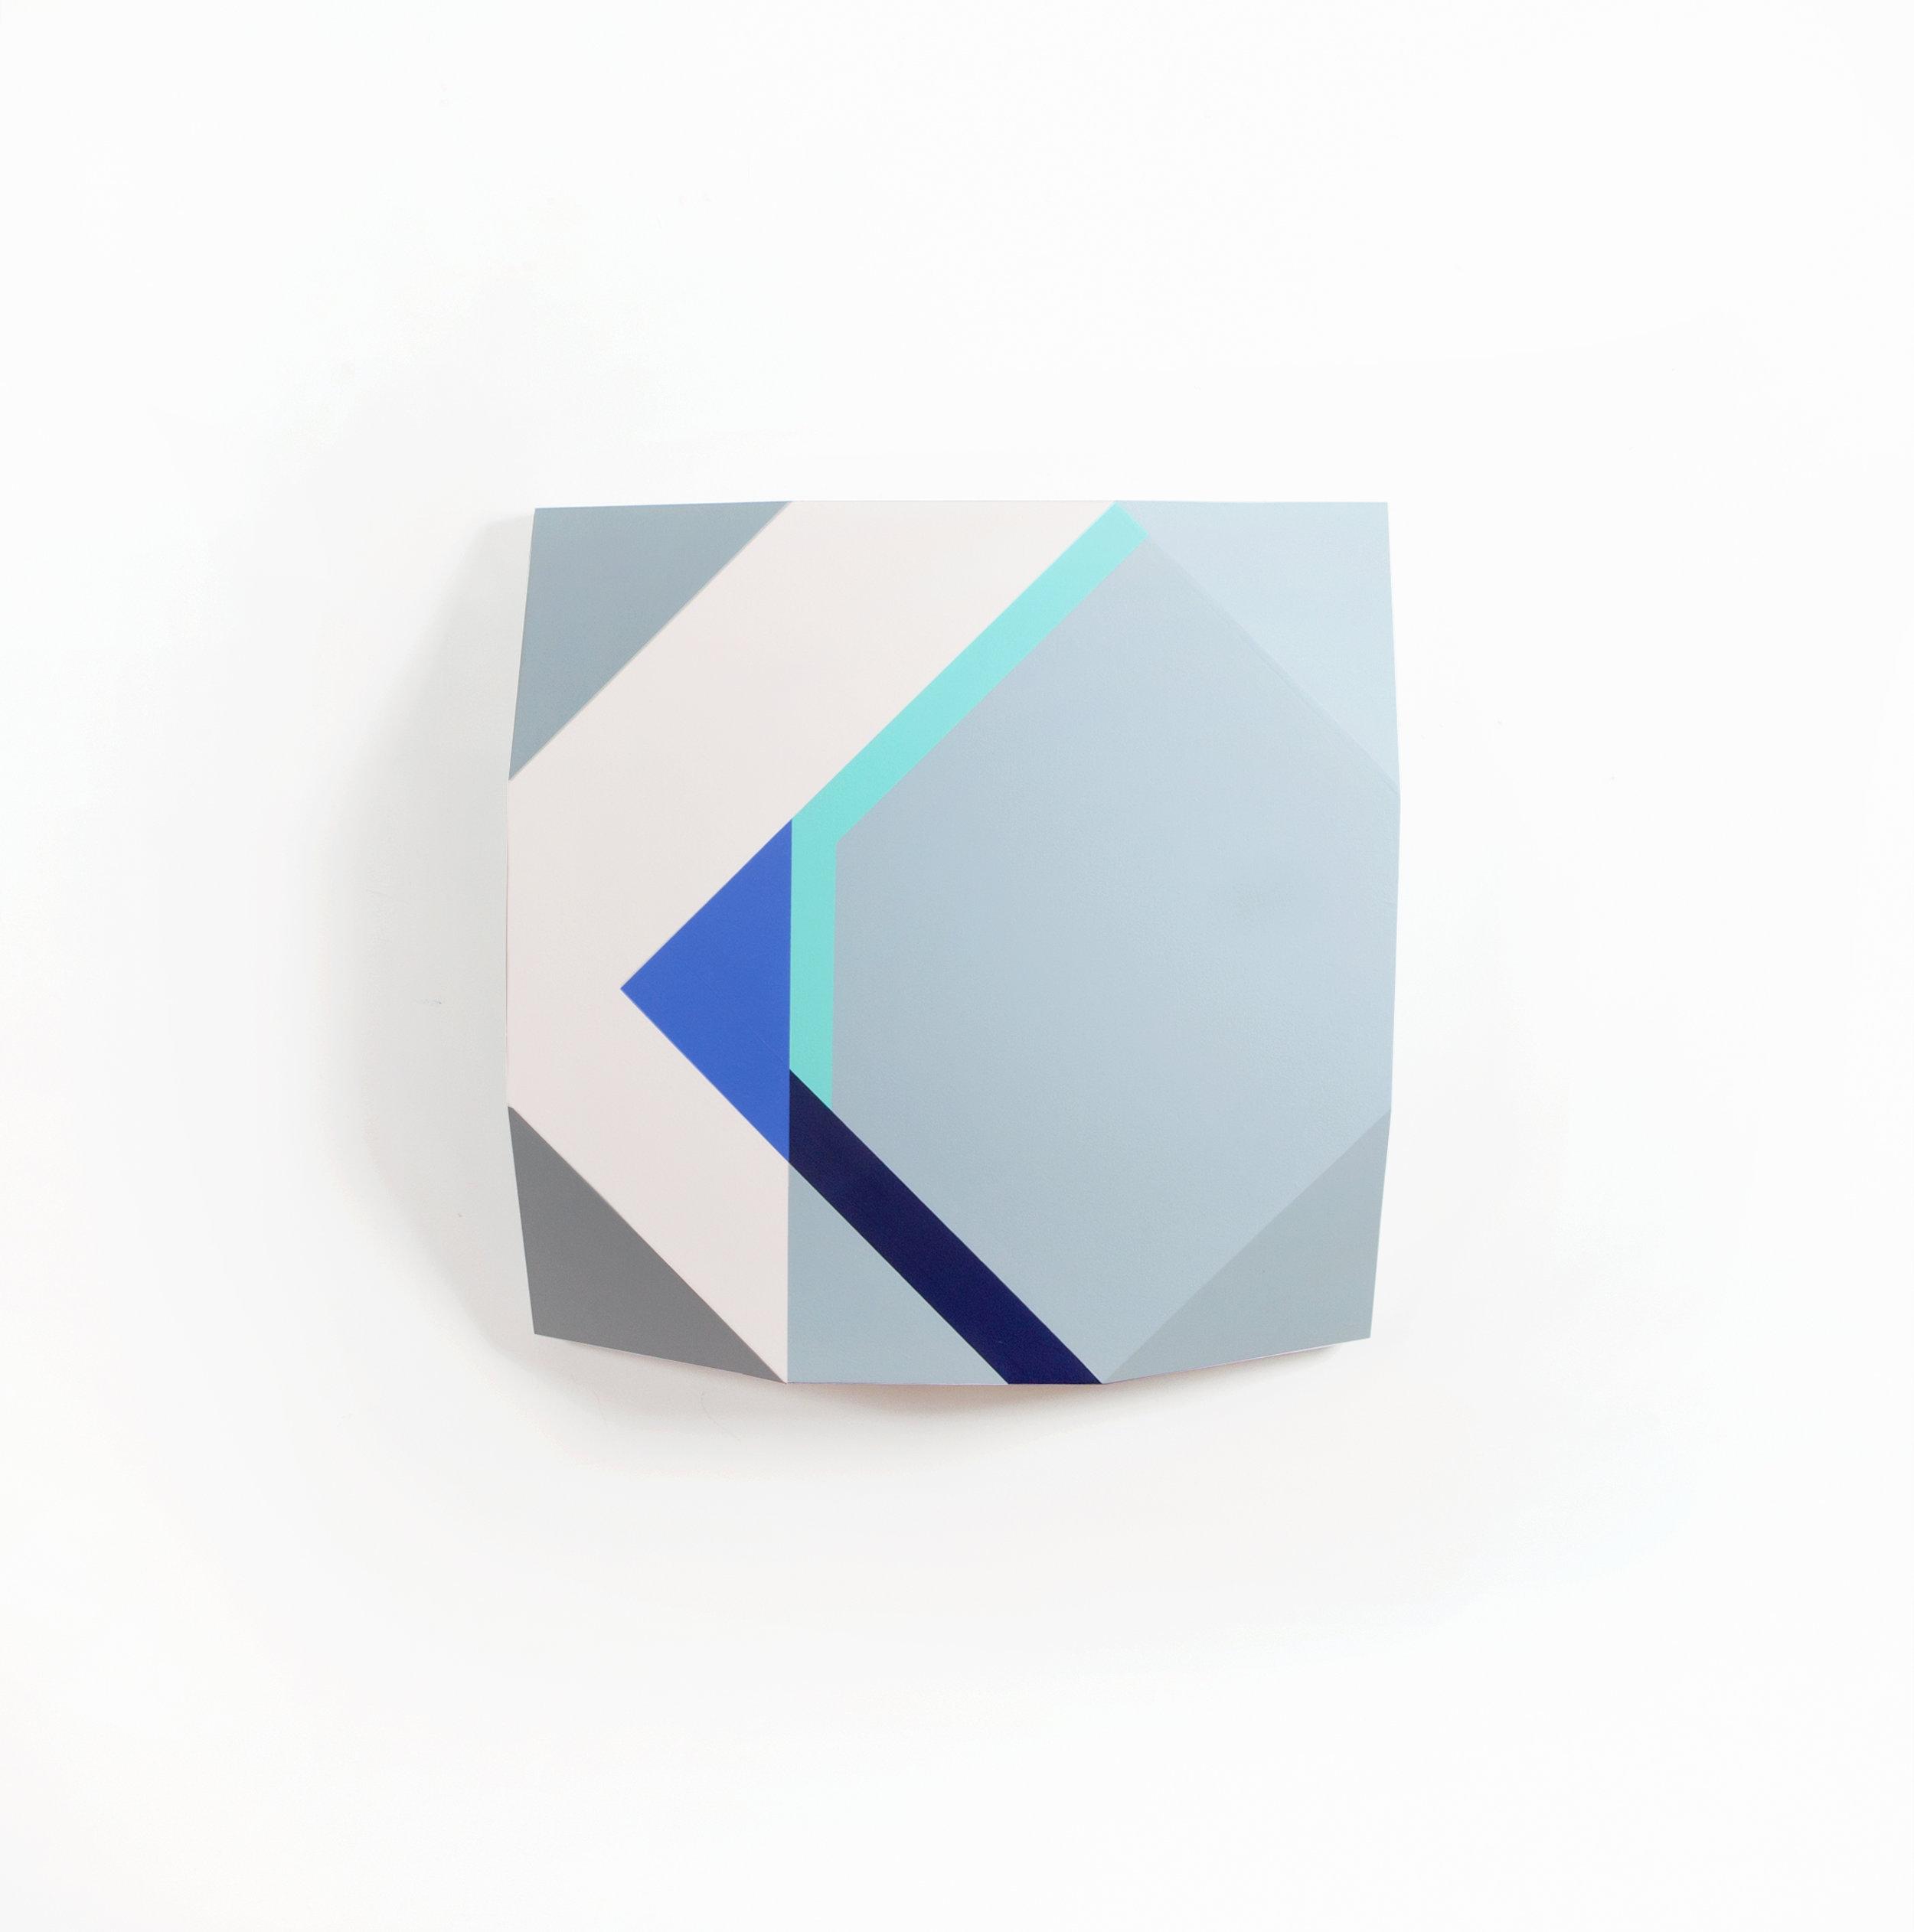 Zin Helena Song   Origami 1 #41   2015   Mixed Media on Wood   20 x 20 x 6 in.